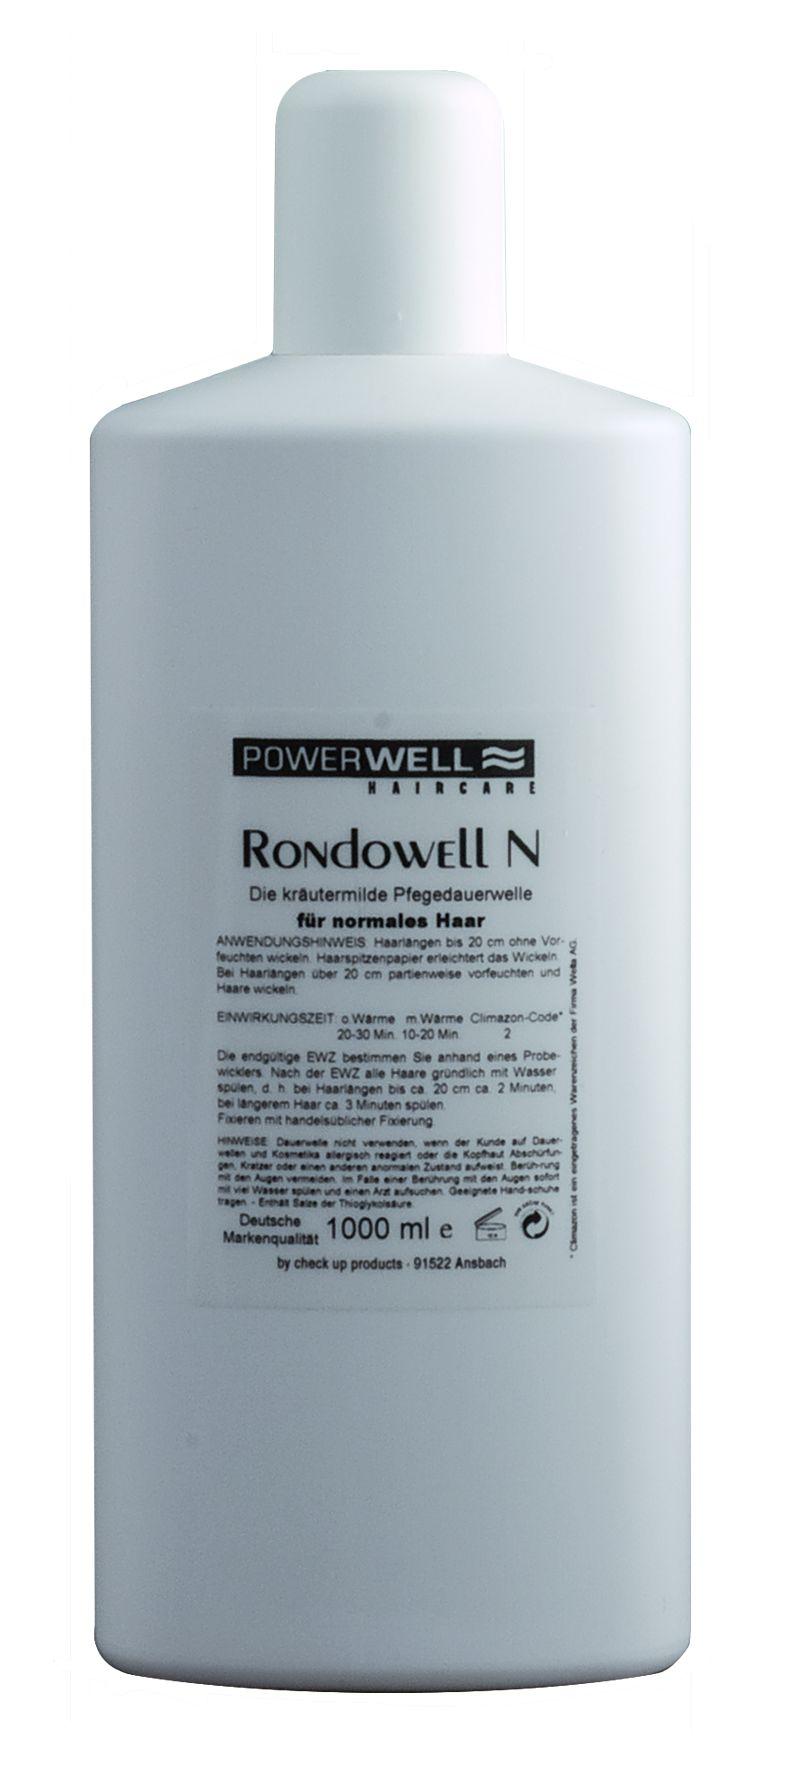 POWERWELL Rondowell Dauerwelle NORMAL 1 L